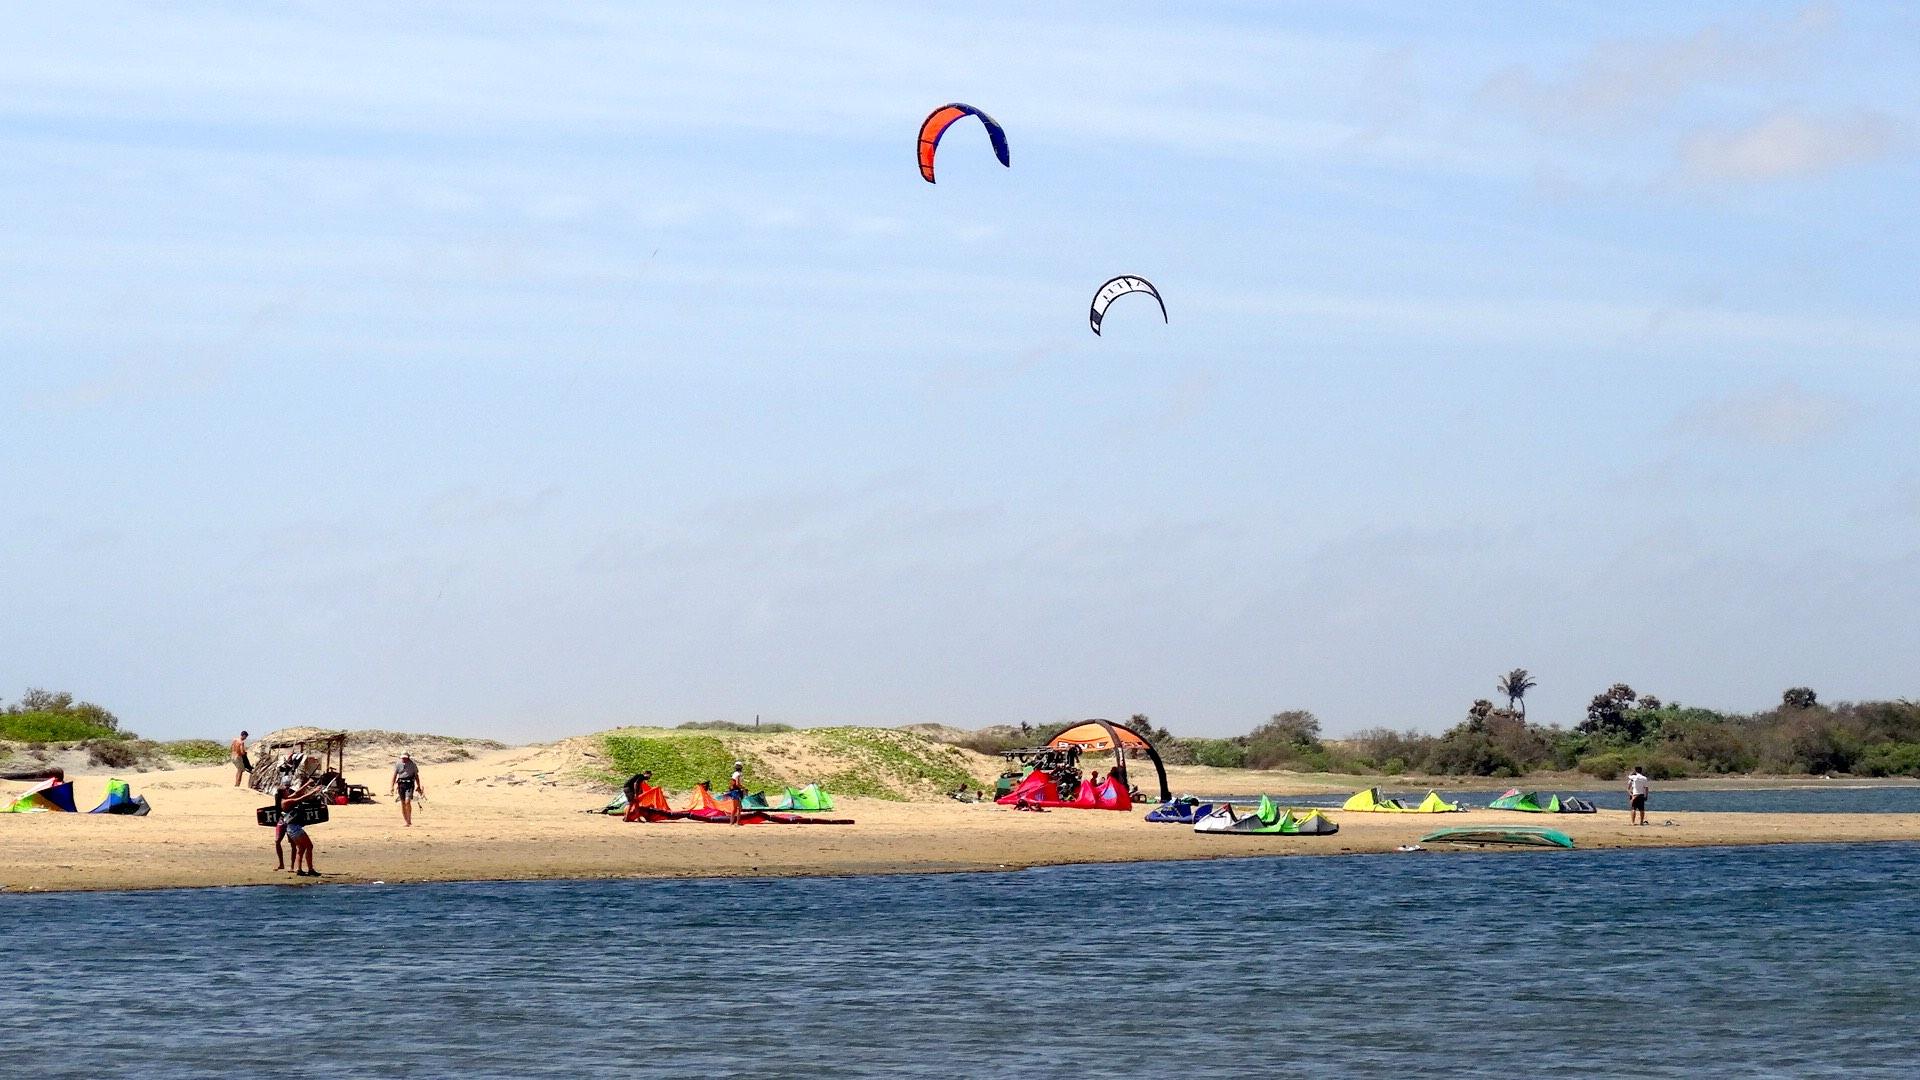 Bluebirdkite Surfen Kitesurfen Sri Lanka